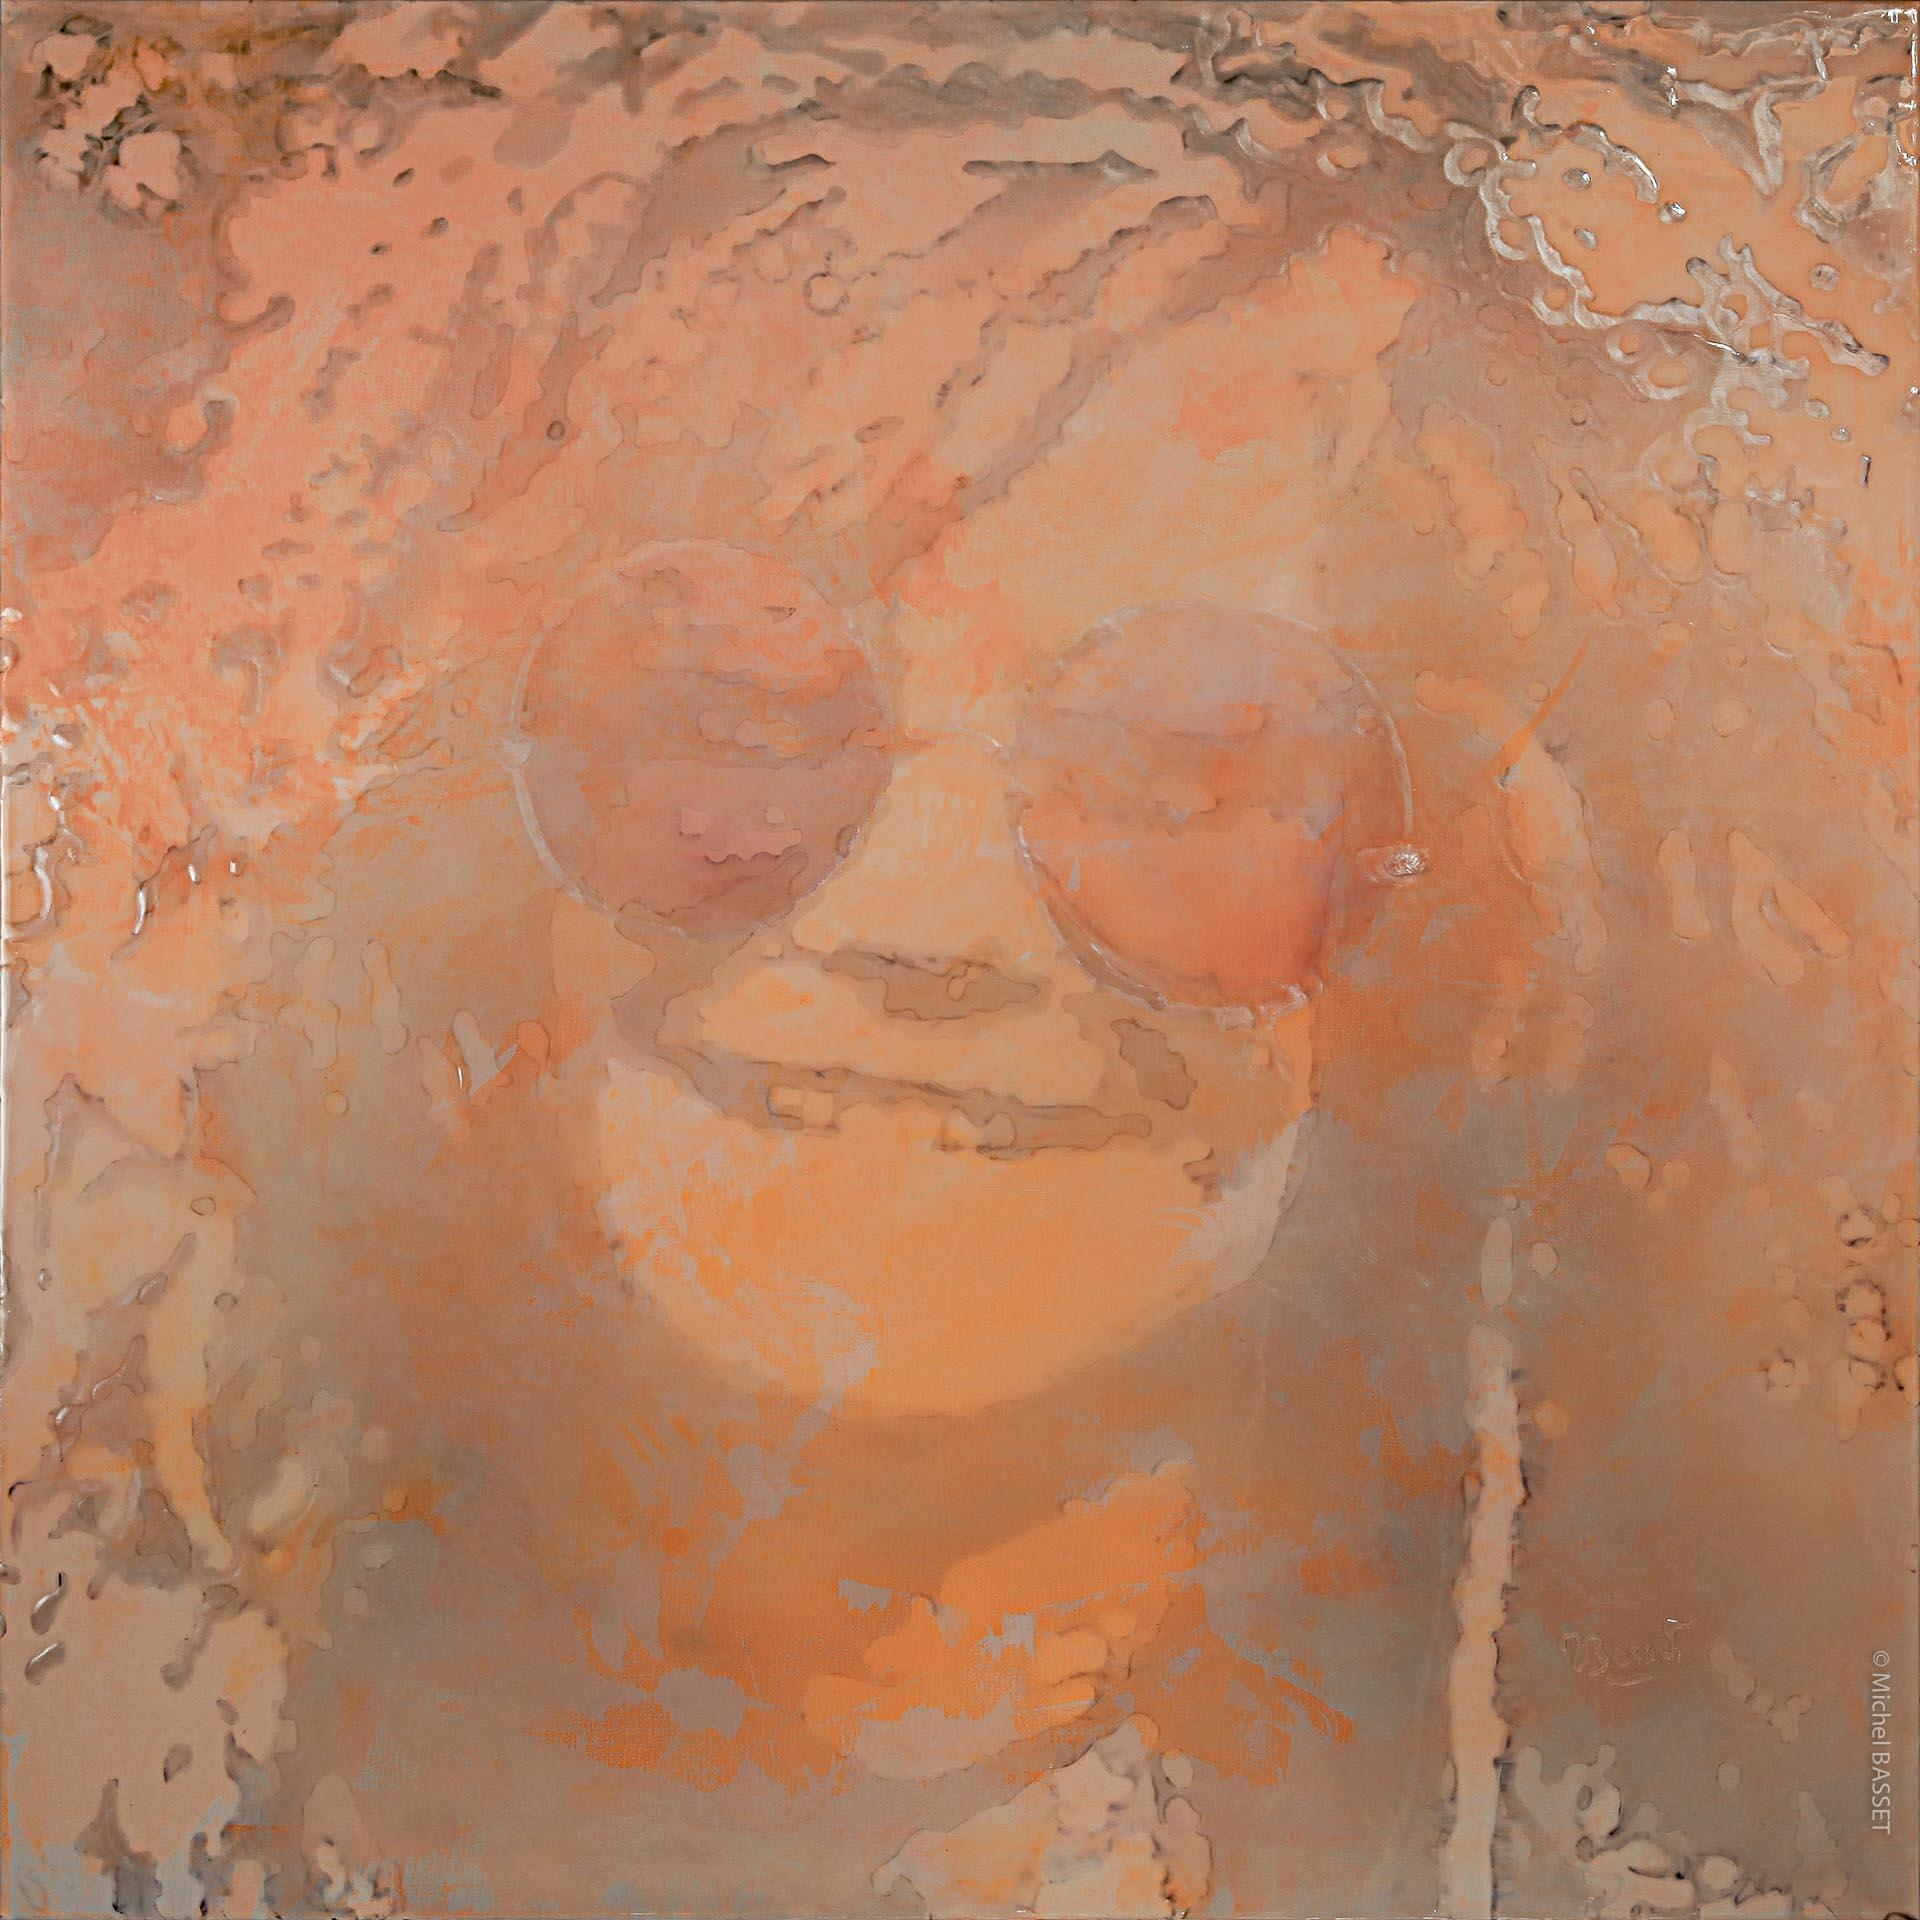 Sister soul - © Michel Basset